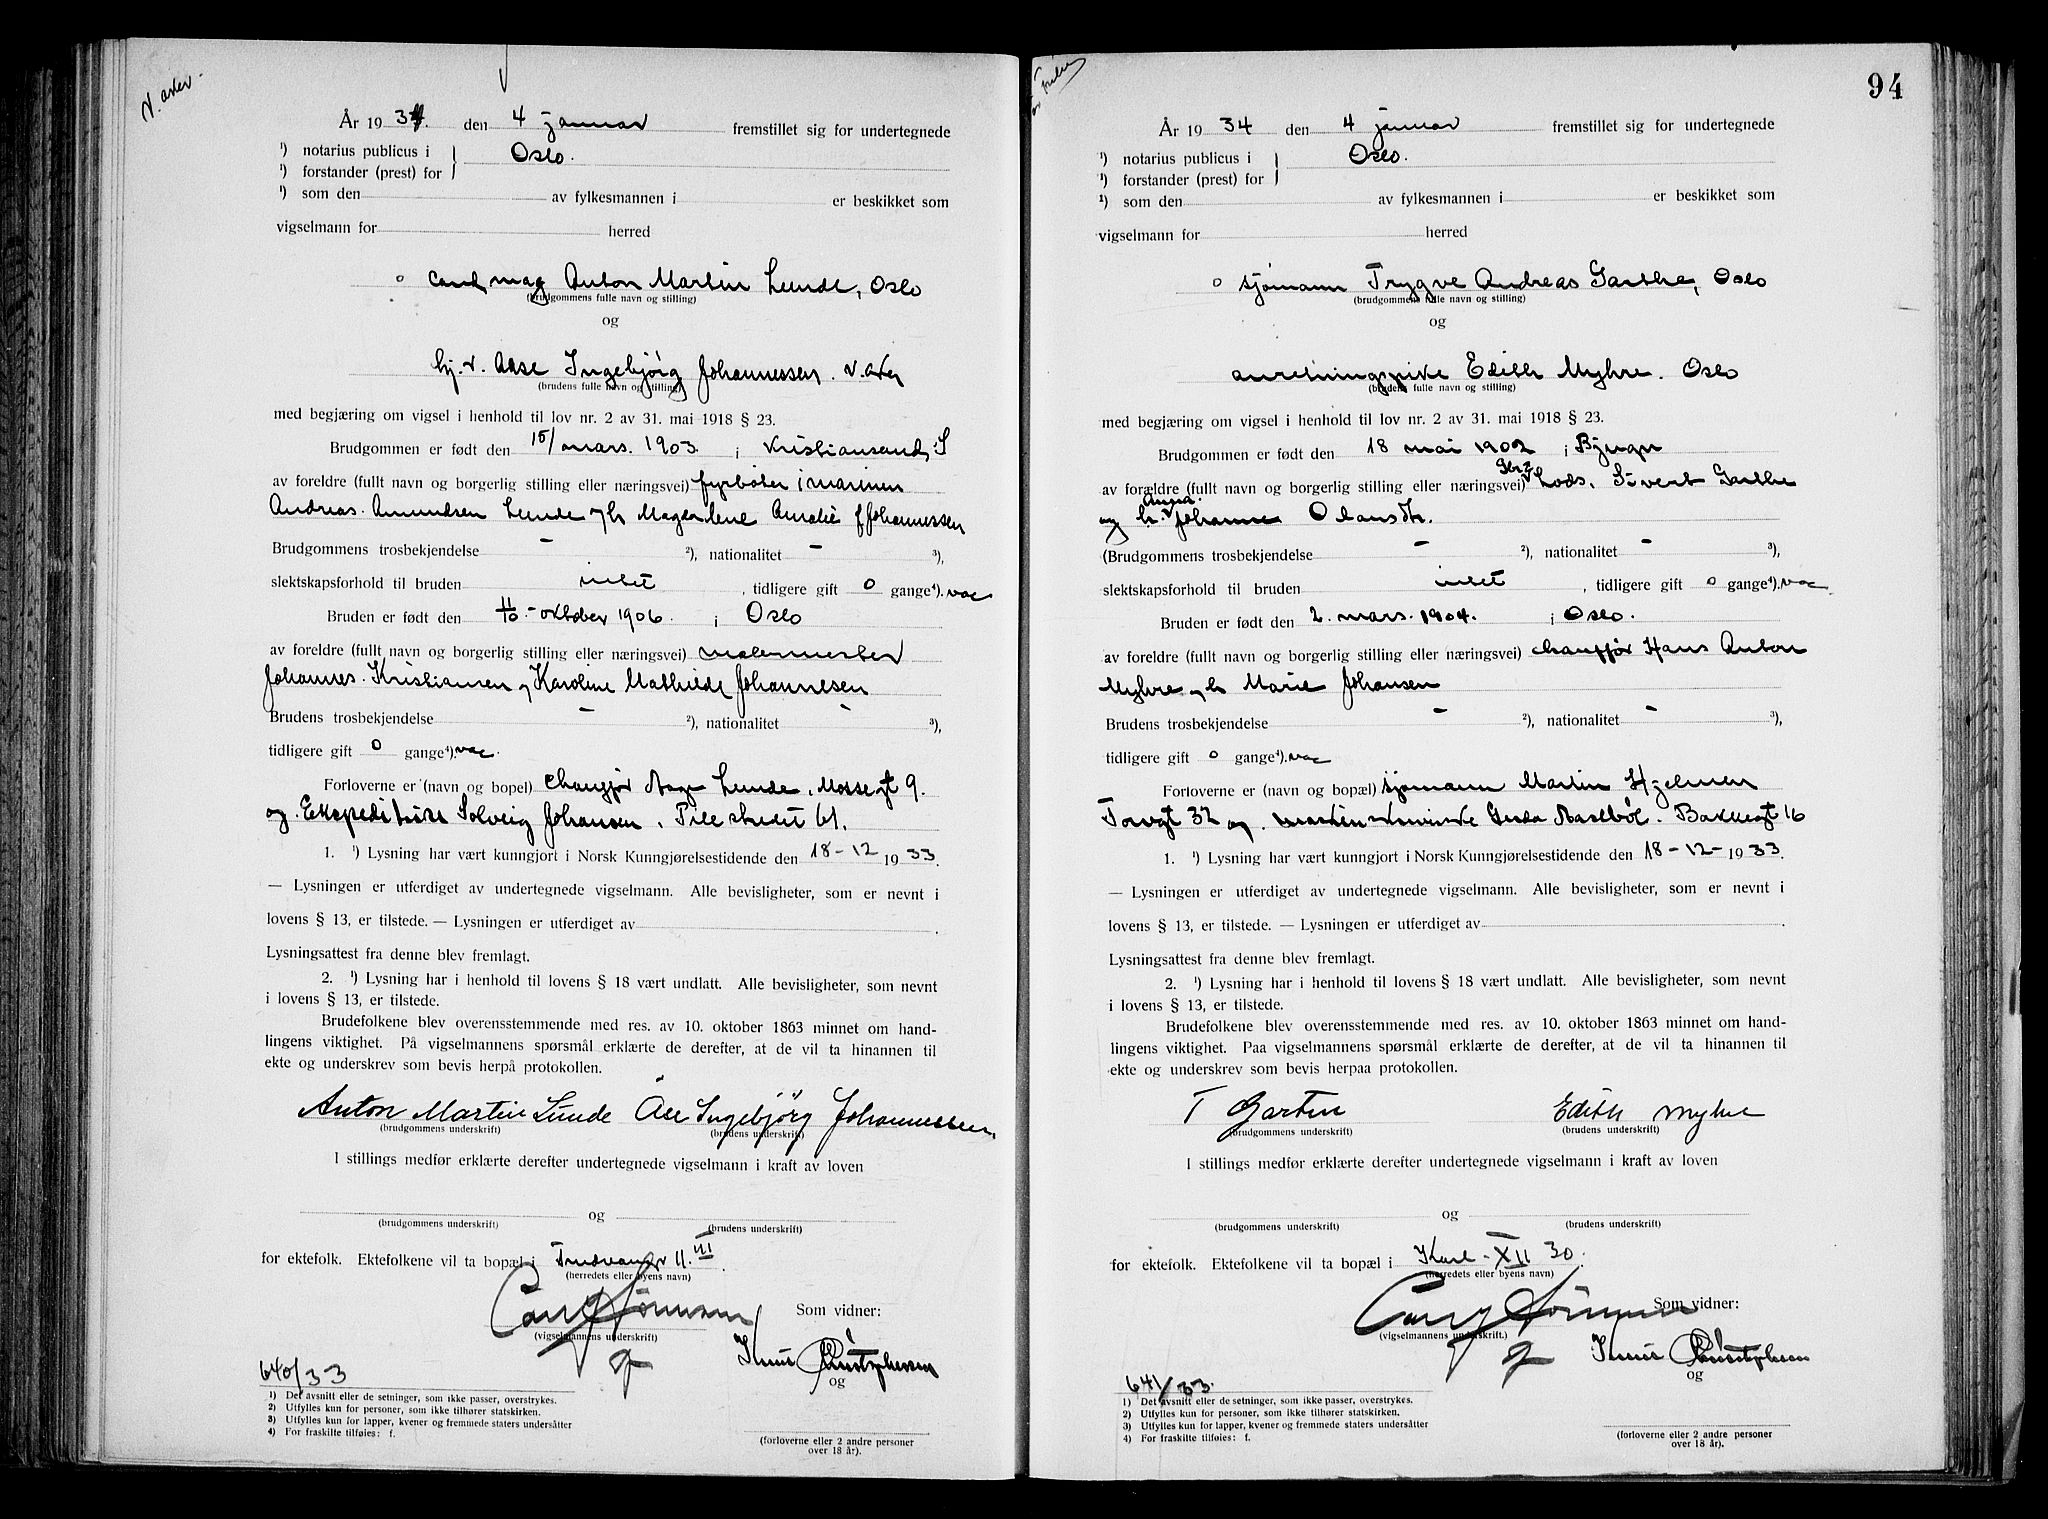 SAO, Oslo byfogd avd. I, L/Lb/Lbb/L0023: Notarialprotokoll, rekke II: Vigsler, 1933-1934, s. 93b-94a